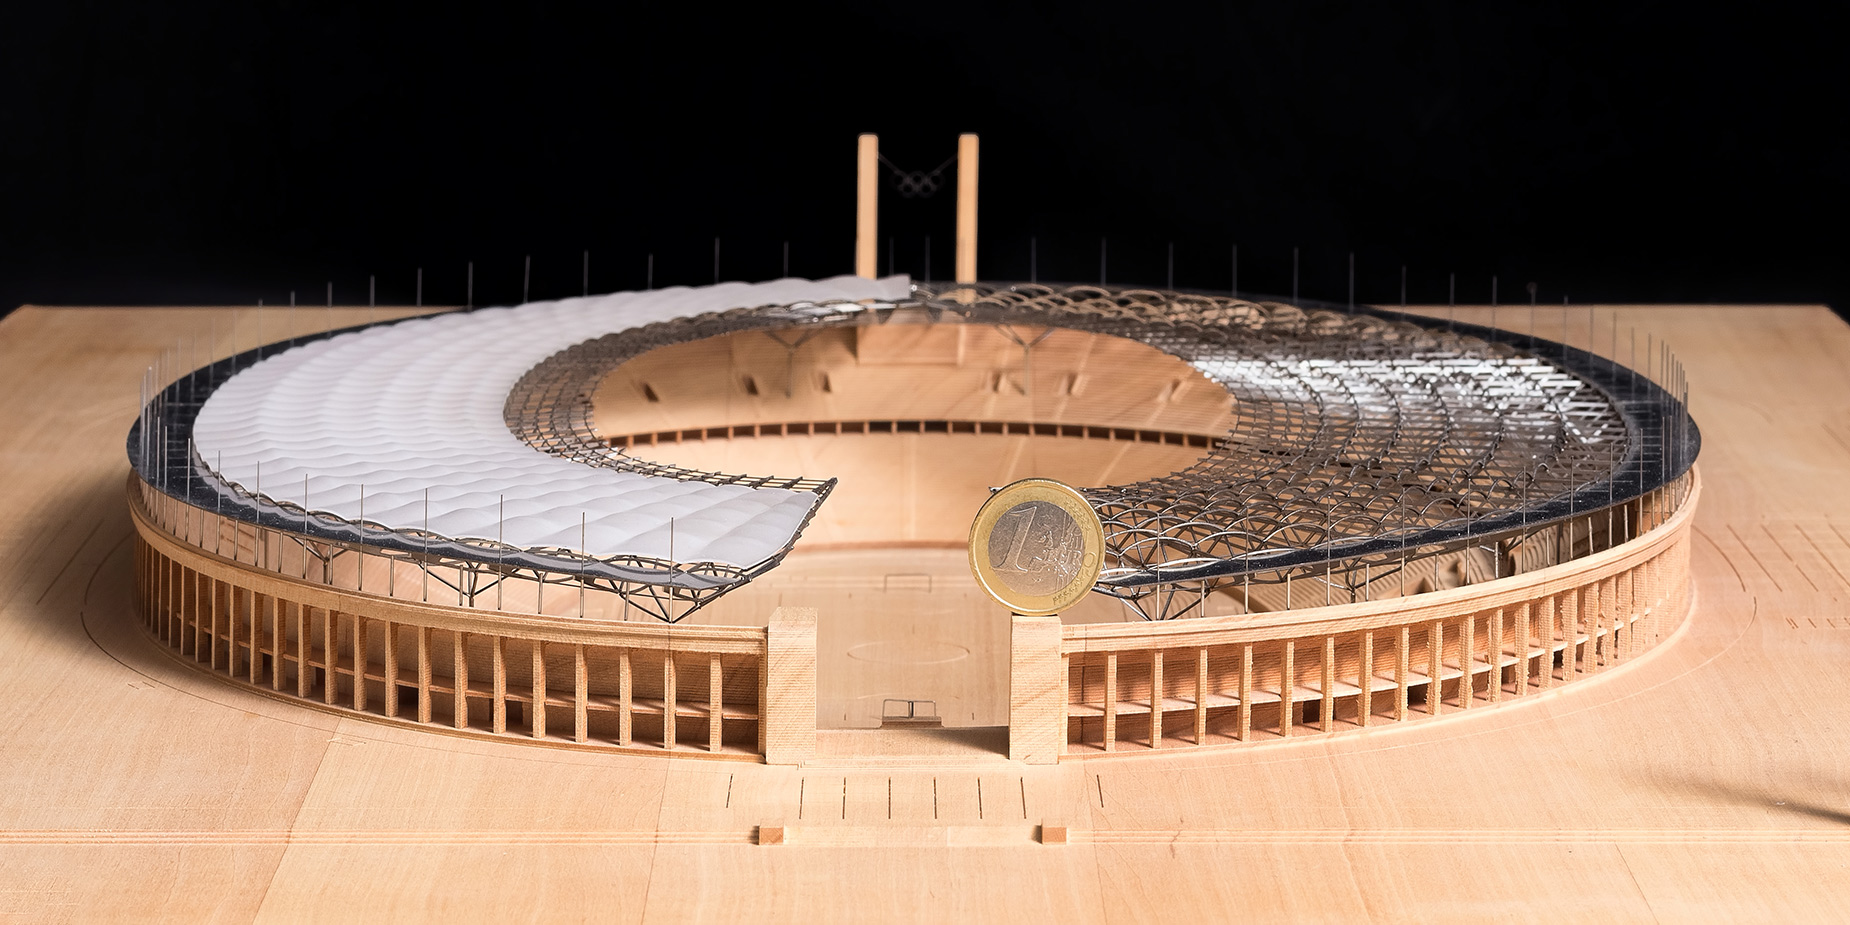 Fotografie Architekturmodell | Olympiastadion Berlin